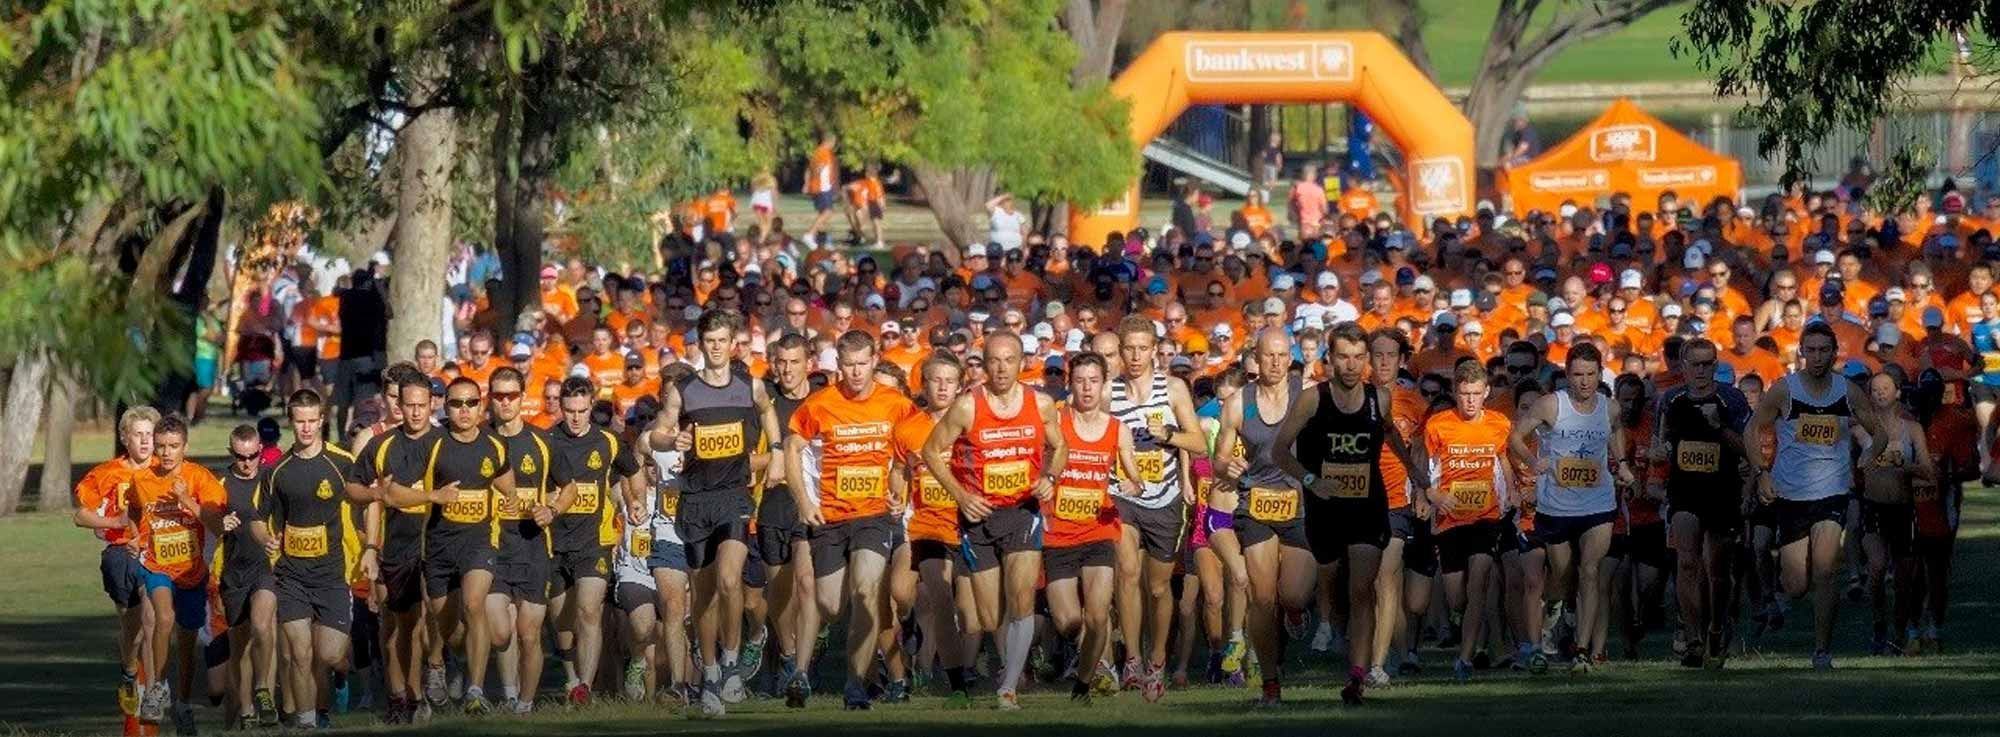 Gallipoli: 10k 5k Gallipoli Run